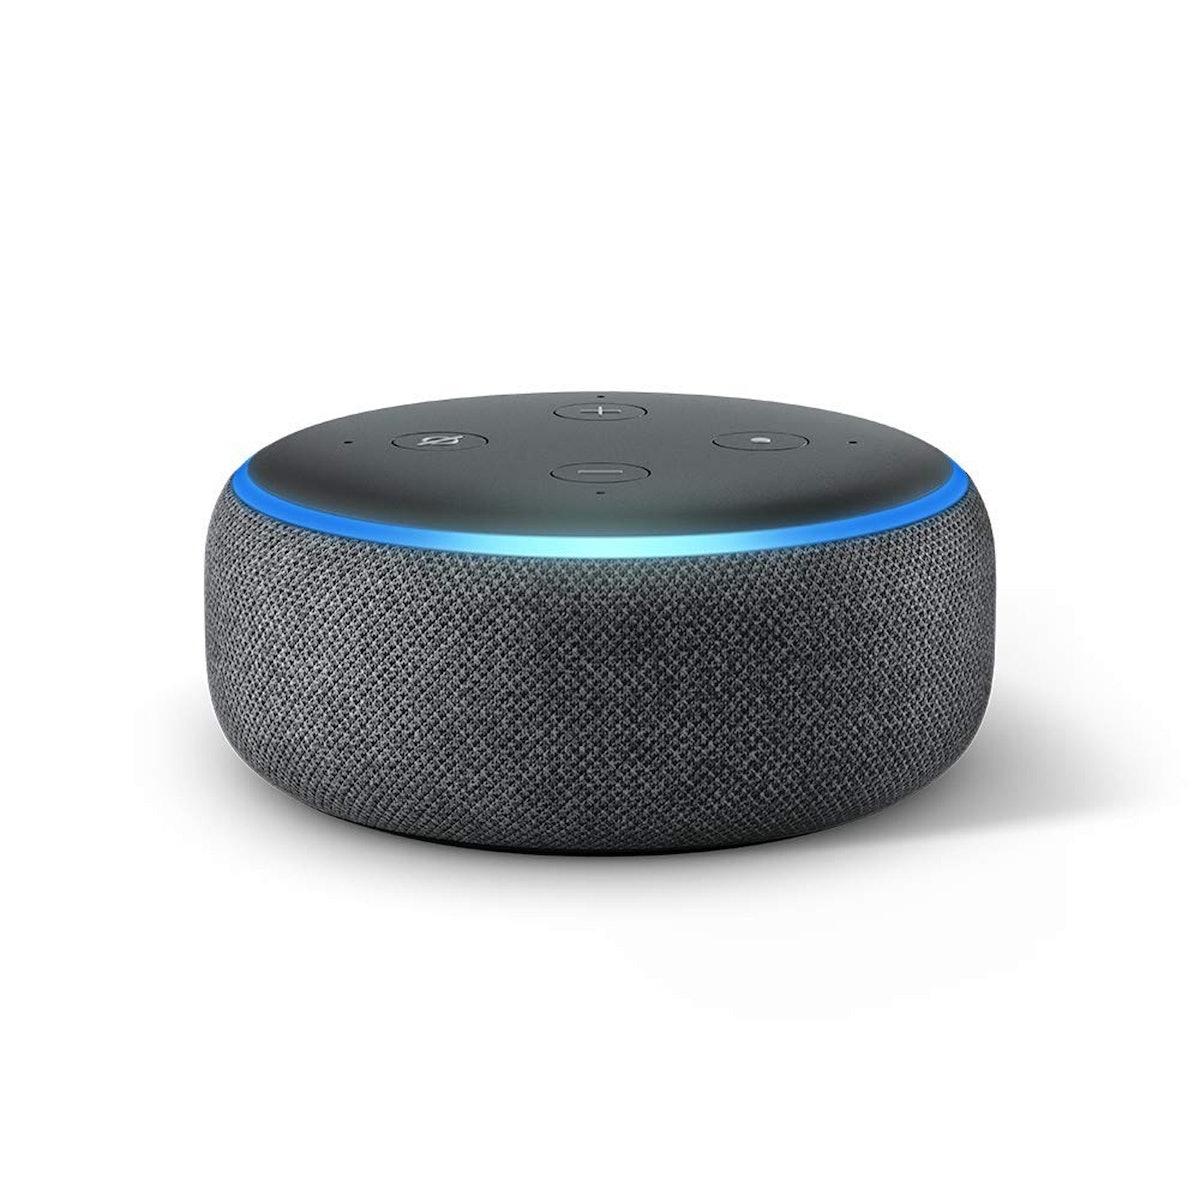 Echo Dot (3rd Gen) - Smart speaker with Alexa